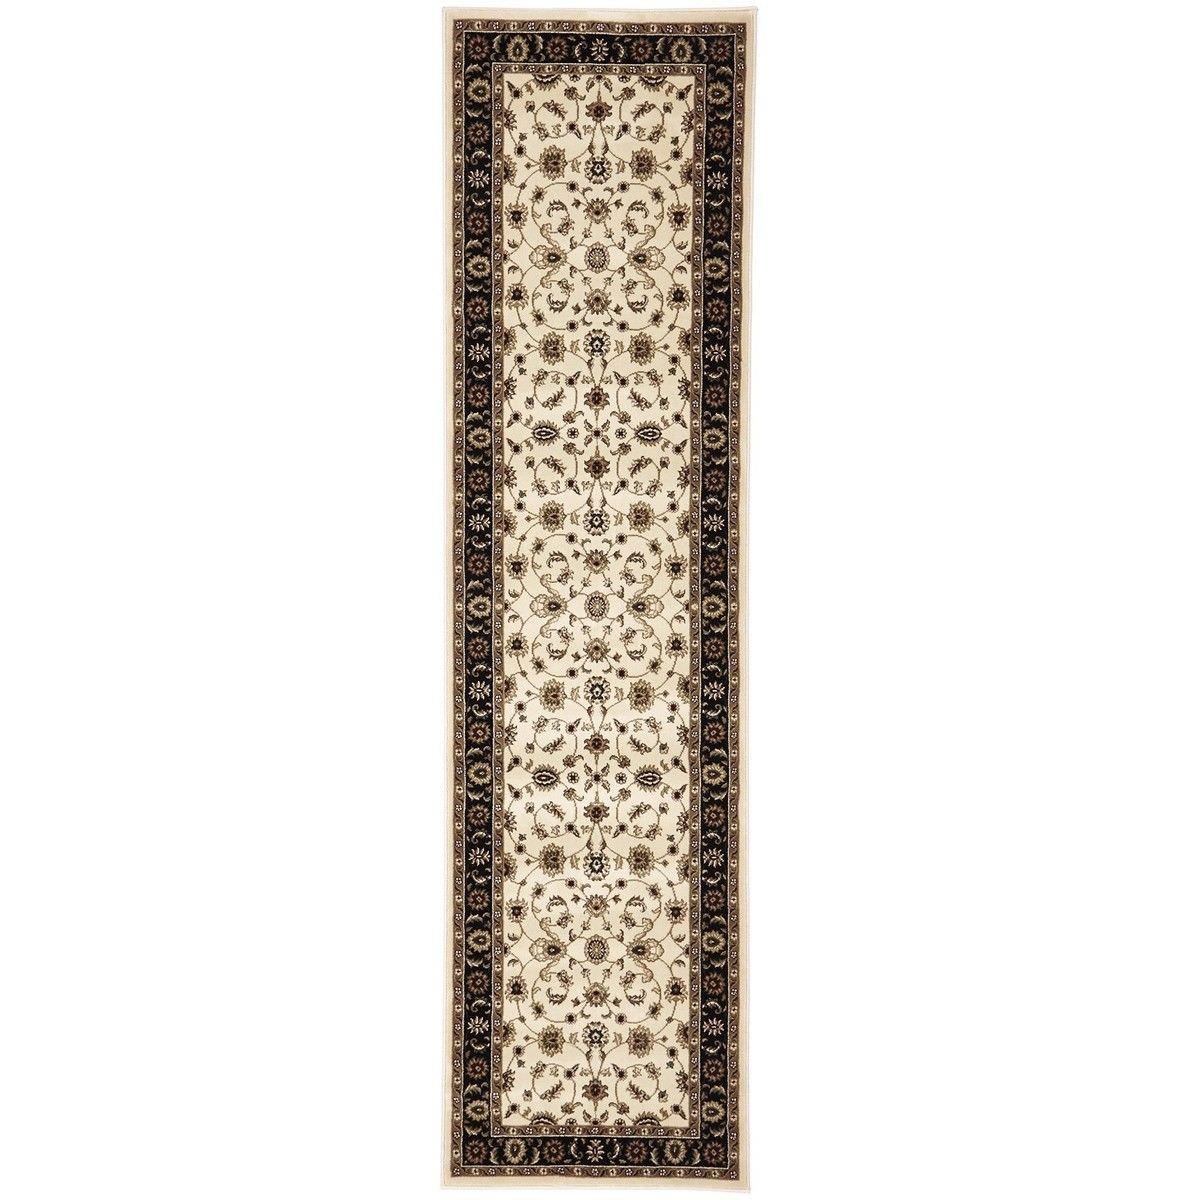 Sydney Classic Turkish Made Oriental Runner Rug, 300x80cm, Ivory / Black